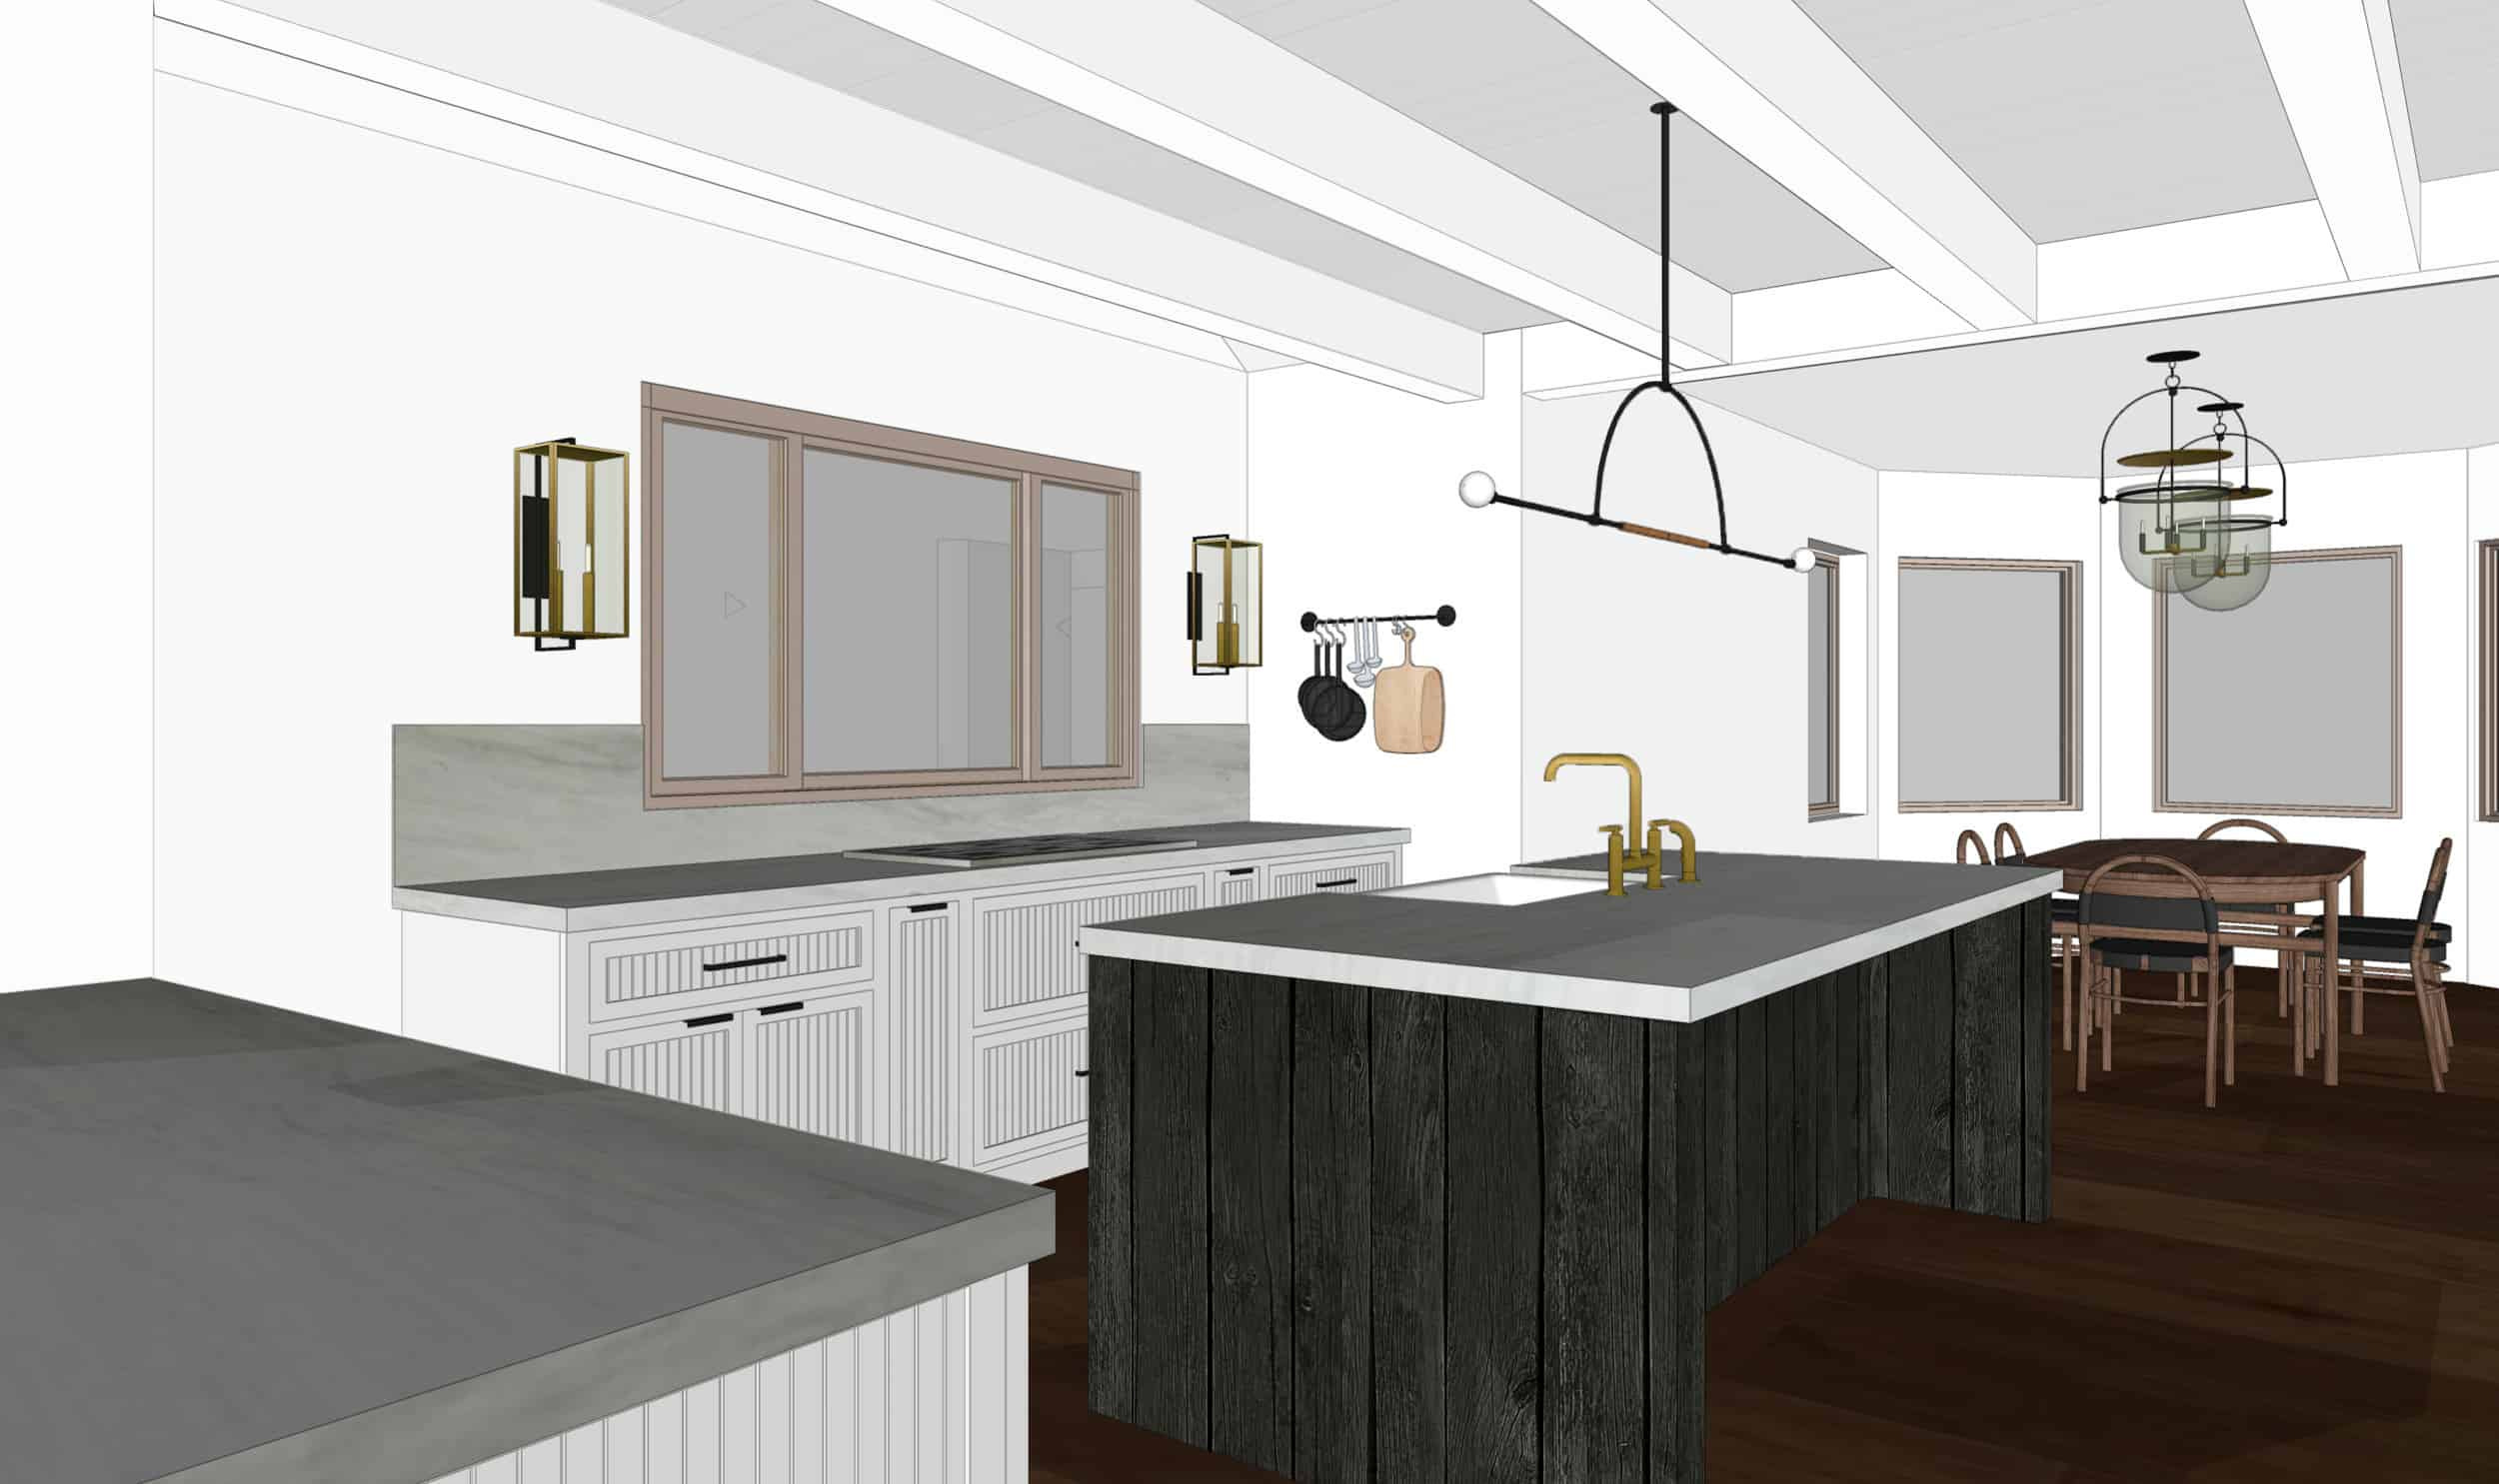 Emily Henderson Mountain Fixer Upper I Design You Decide Kitchen Render 03 Fnladj